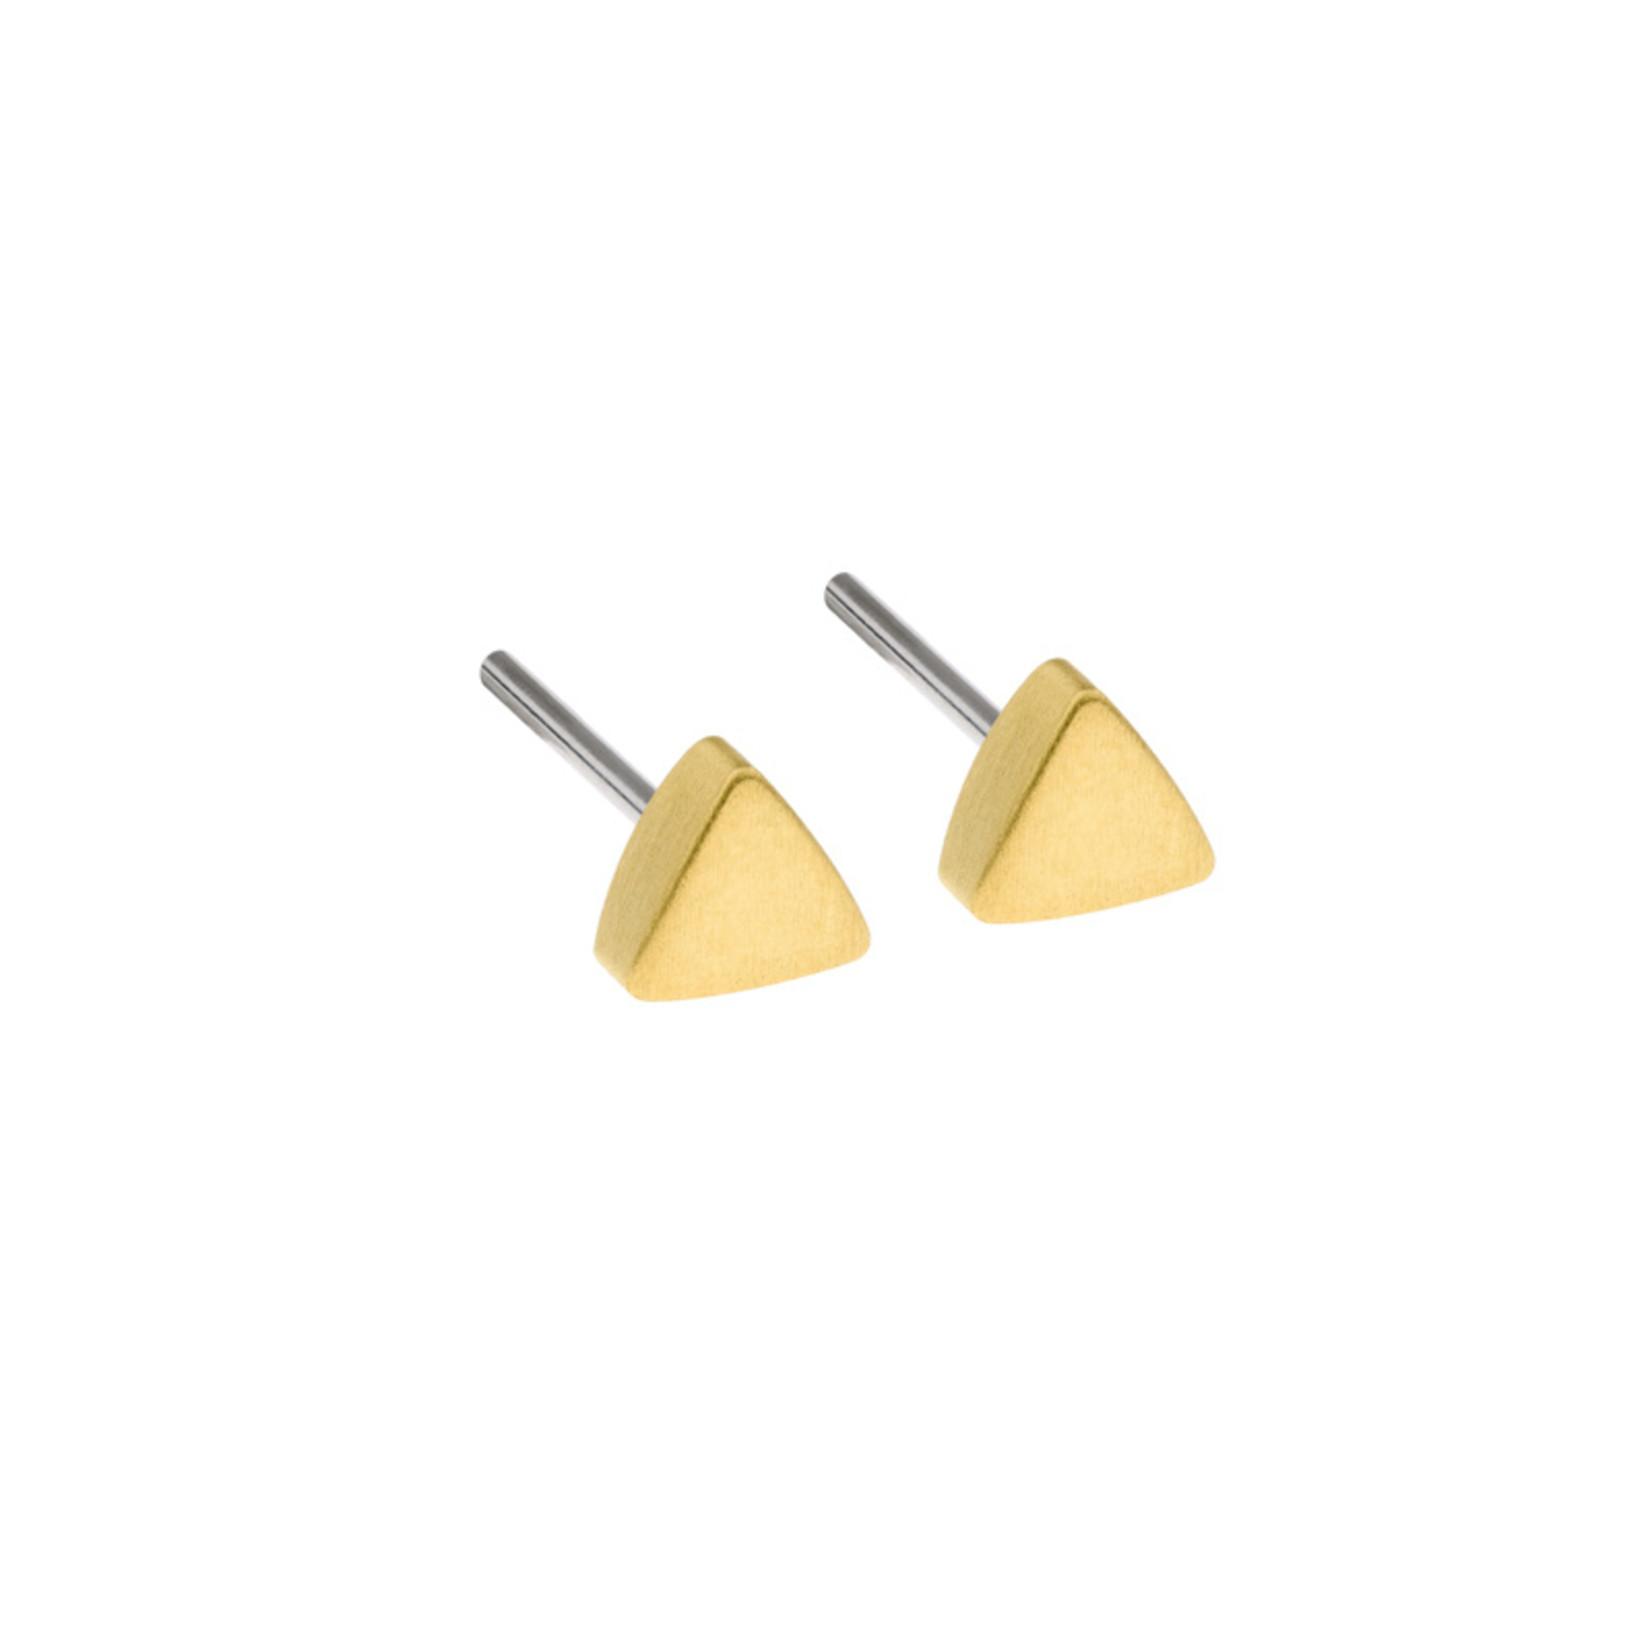 Ernstes Design Stahlschmuck Ohrstecker E414 I Ernstes Design I 4 mm I Edelstahl matt gold